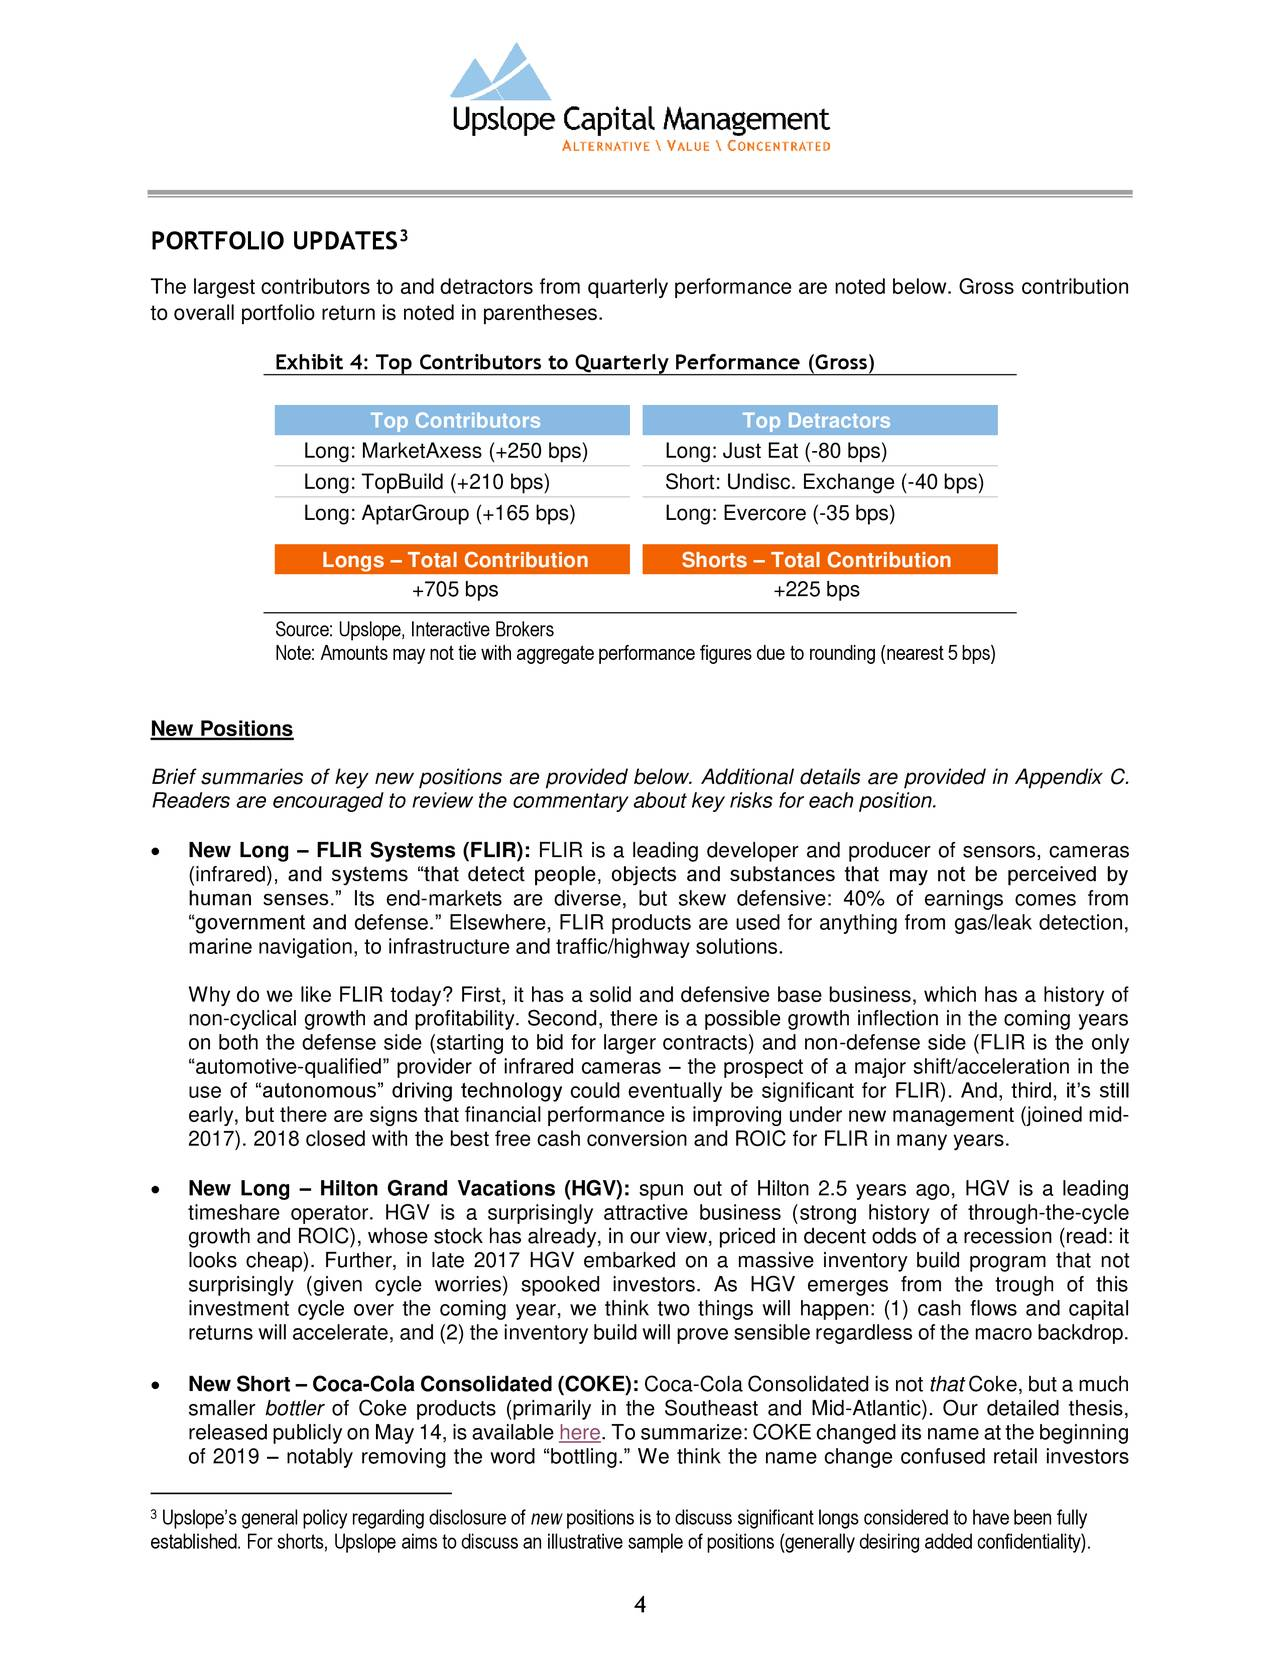 Upslope Capital Q2 2019 Investor Letter | Seeking Alpha